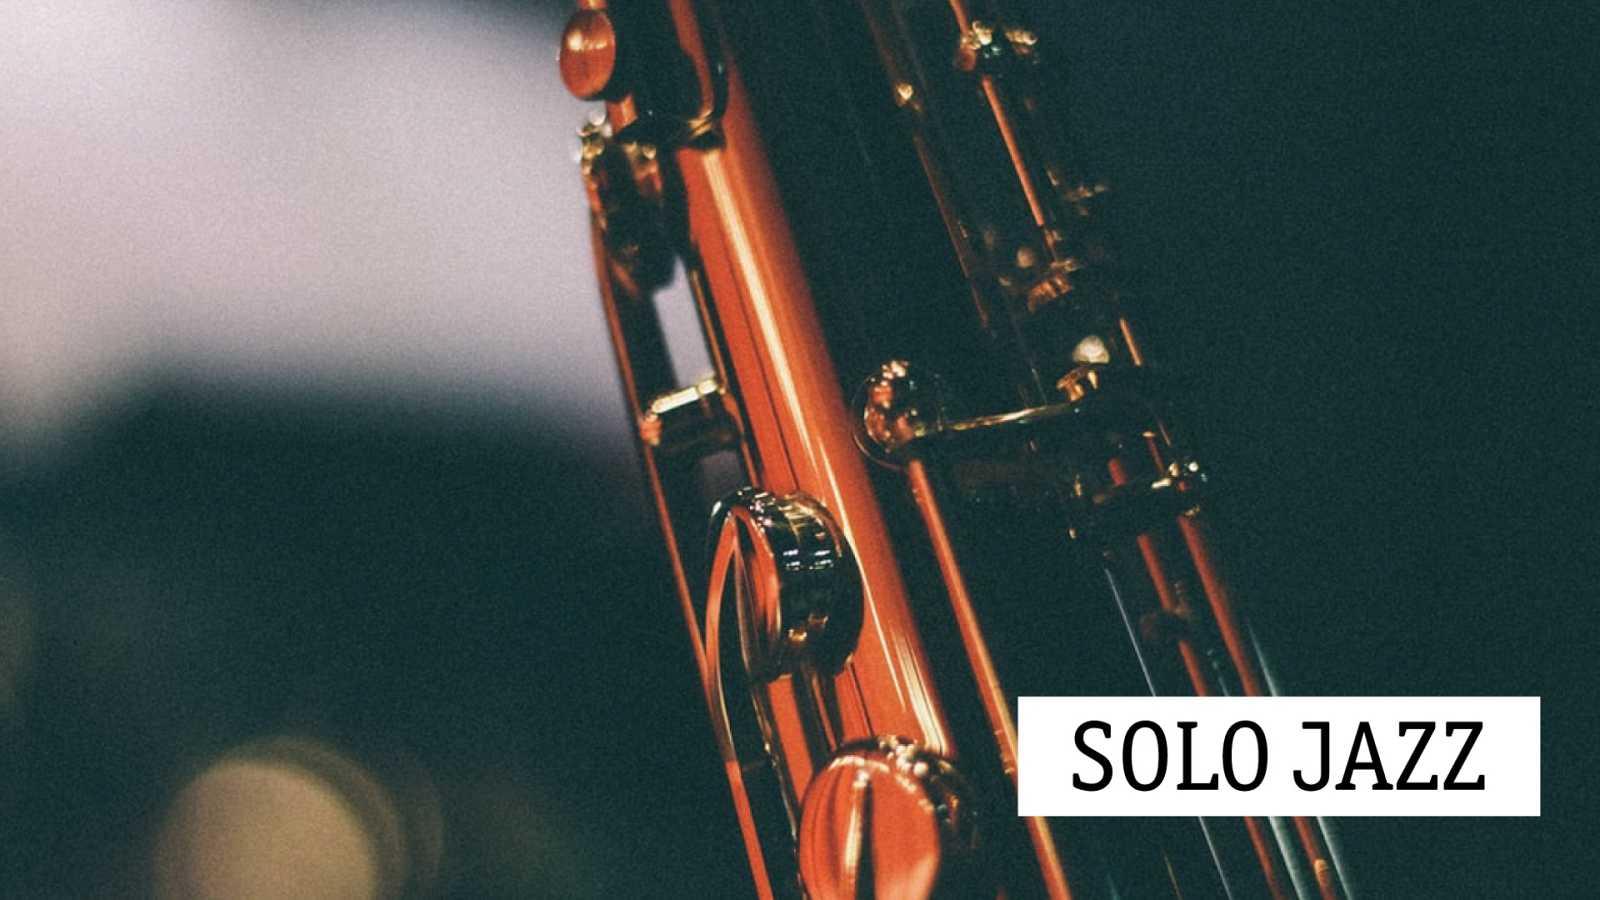 Solo jazz - Fred Frith: Música disconforme - 10/05/21 - escuchar ahora